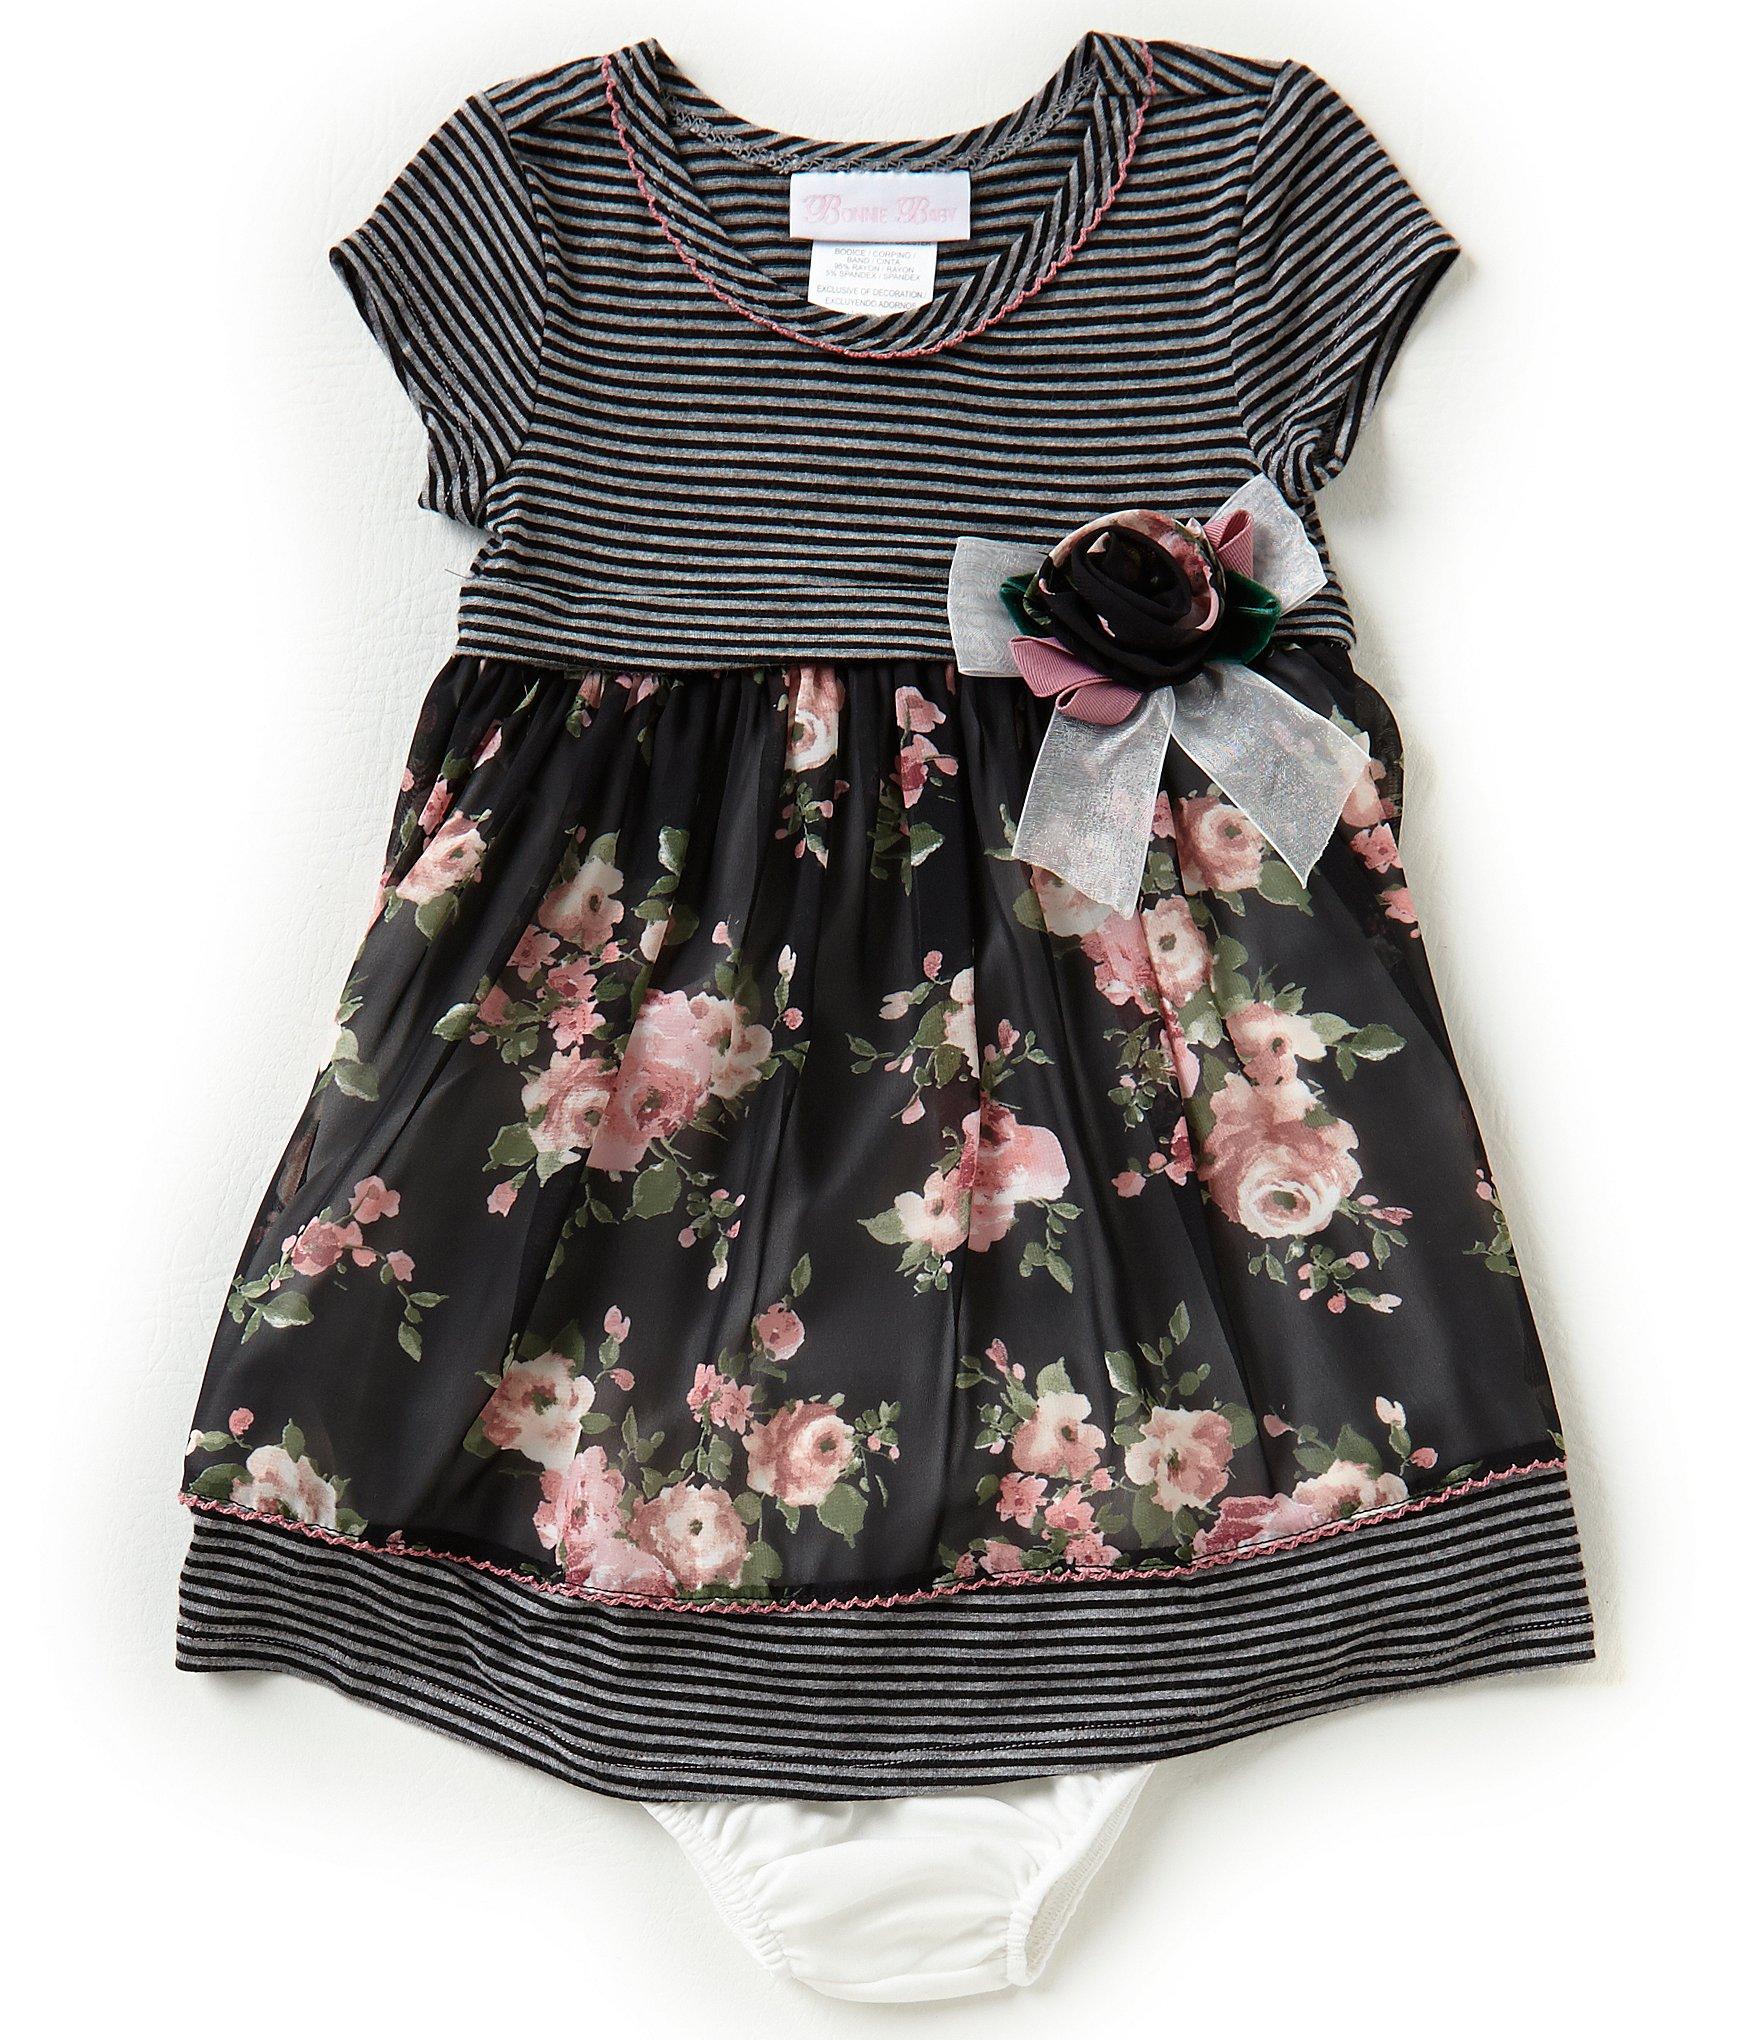 Black dress for baby girl - Black Dress For Baby Girl 28